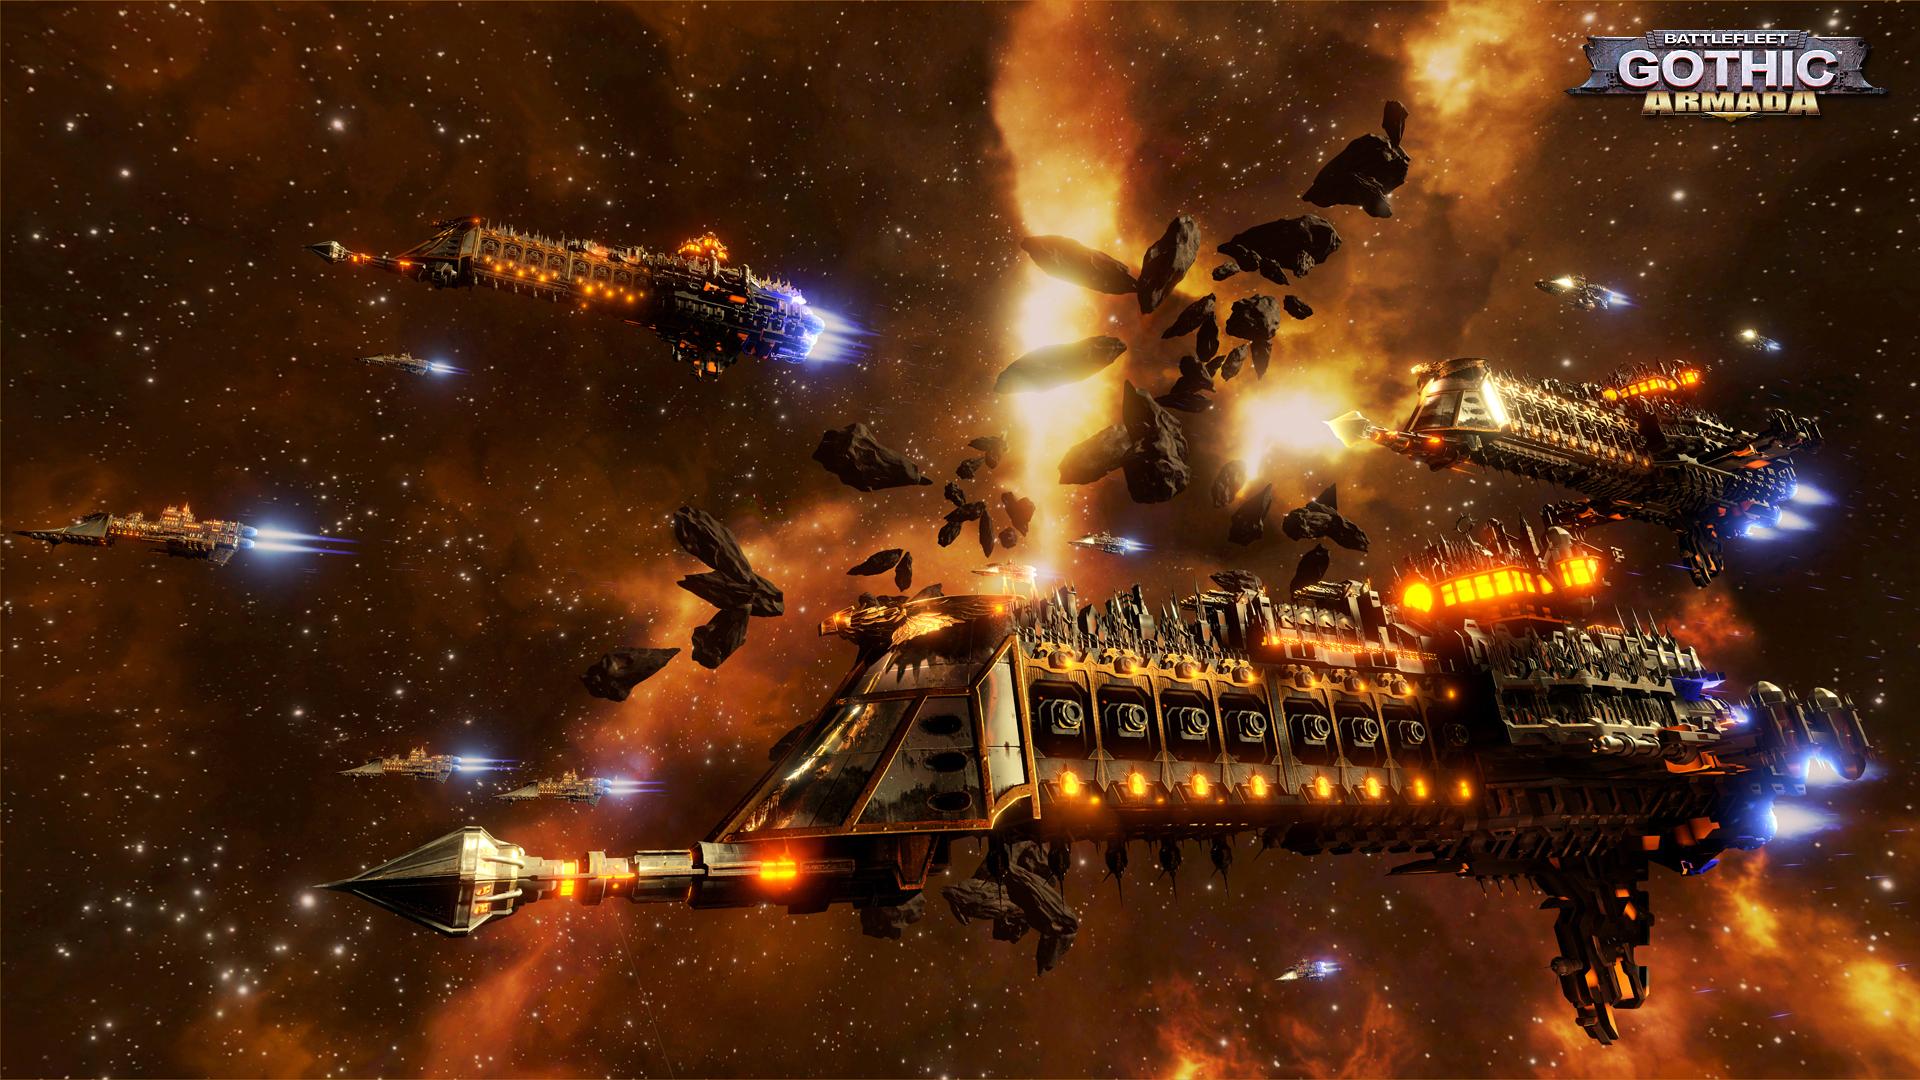 [Jeu vidéo] Battlefleet Gothic : Armada 1421405506-144-capture-d-ecran-pc